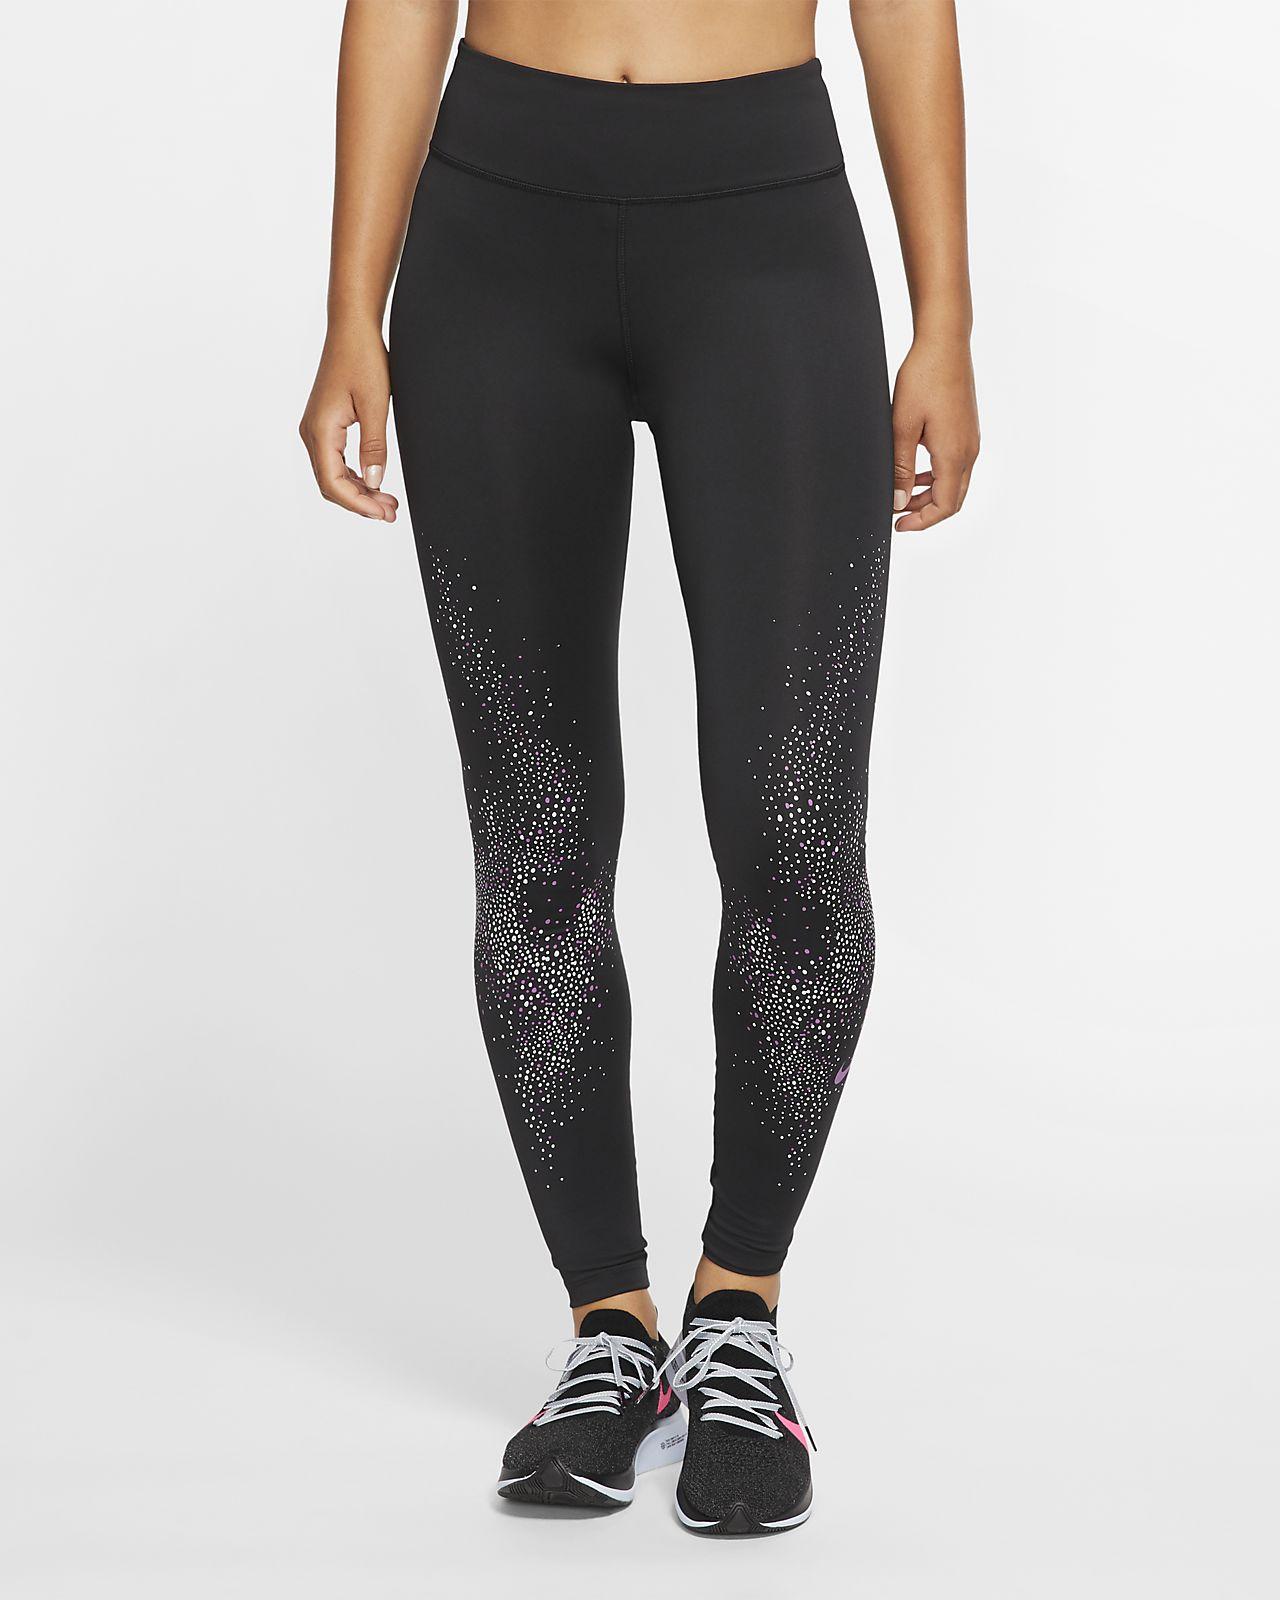 Nike Fast Women's Running Tights